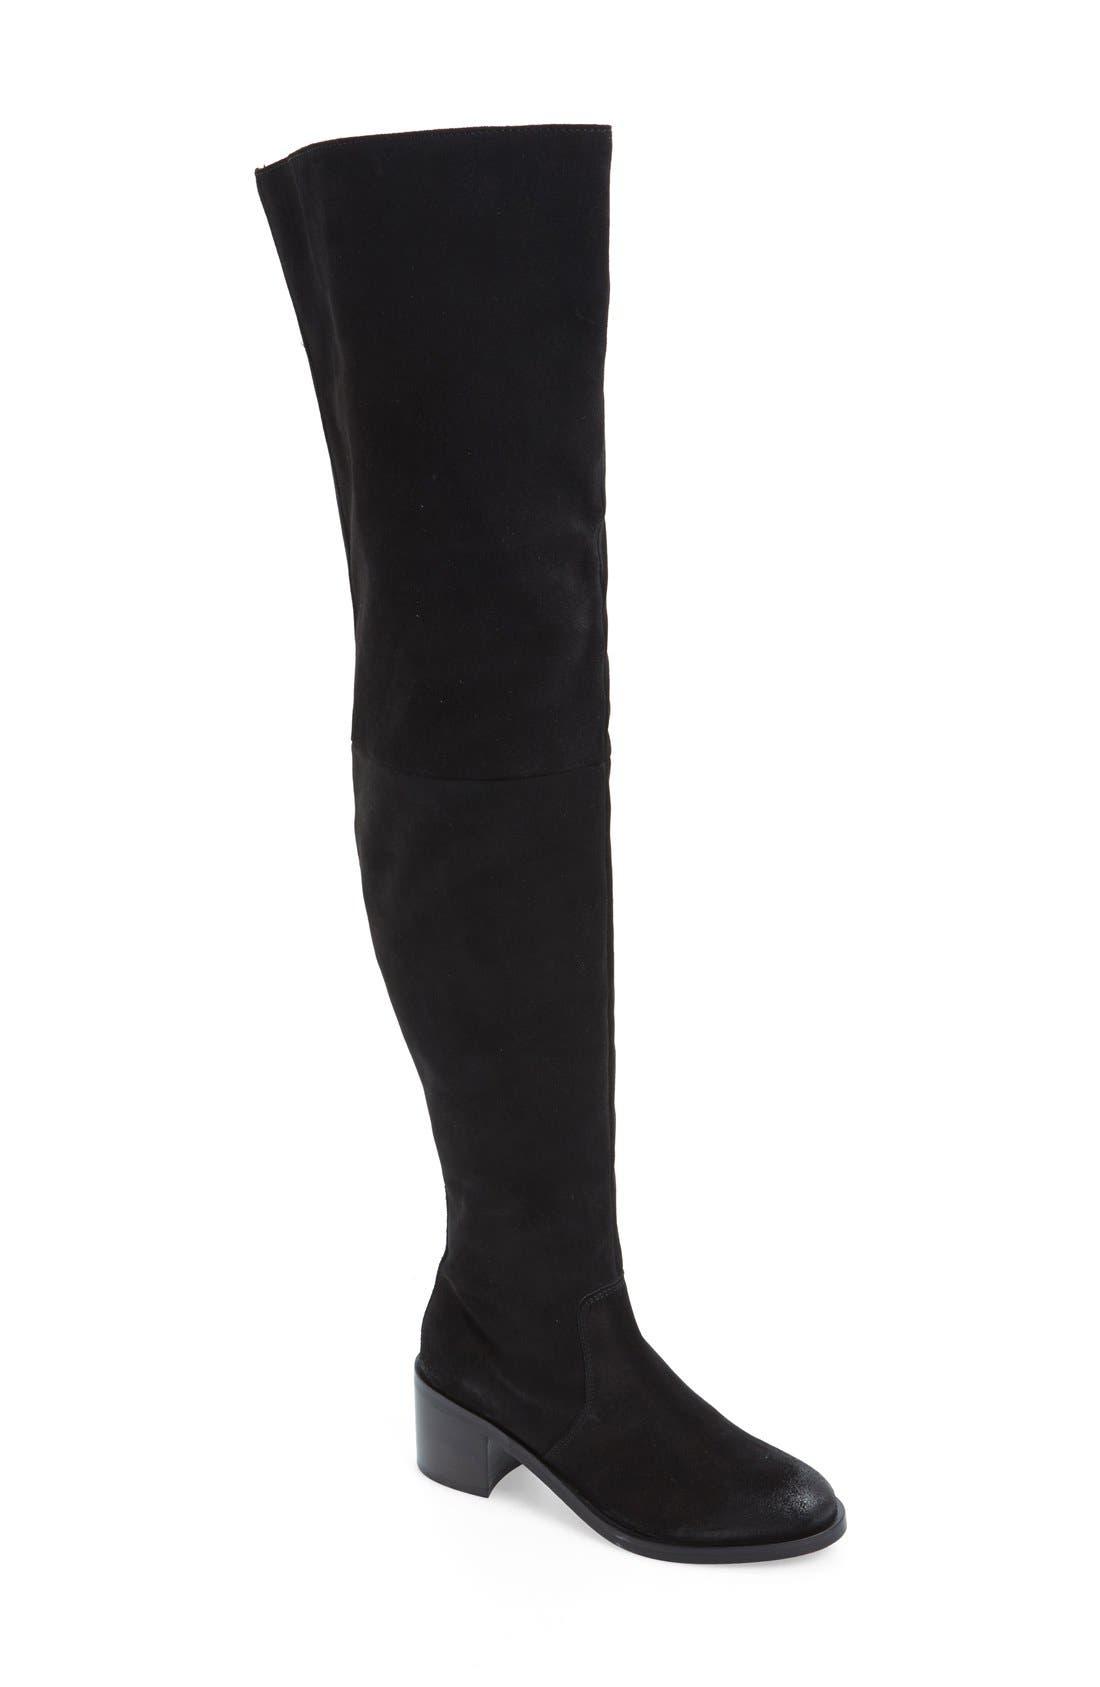 SEYCHELLES, 'Sardonyx' Thigh High Boot, Main thumbnail 1, color, 001